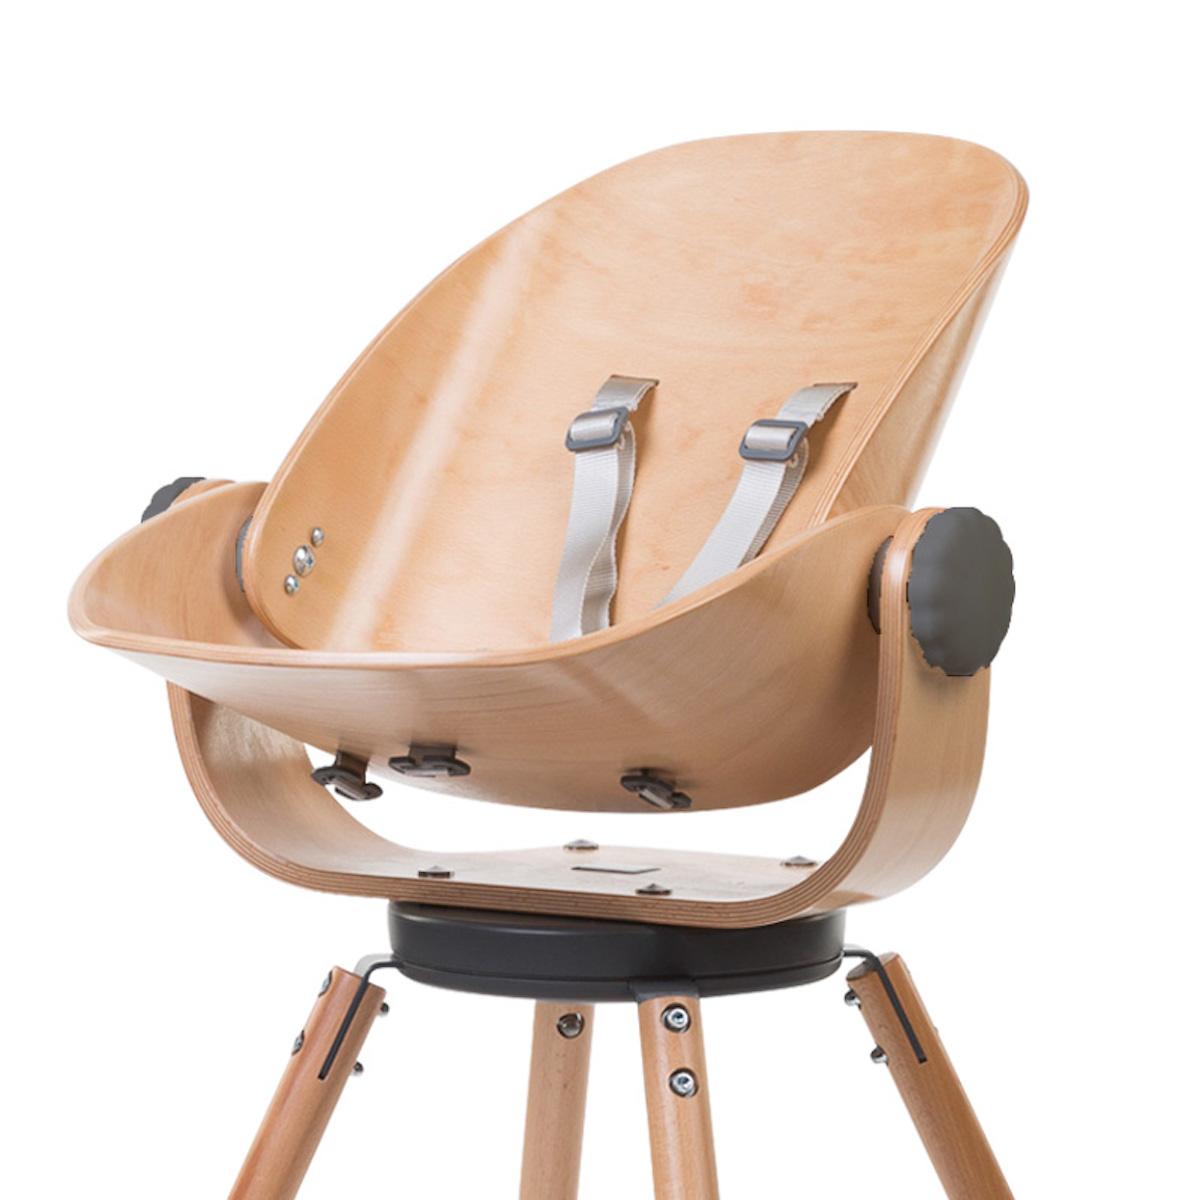 Childhome EVOLU NEWBORN SEAT für EVOLU 2 + ONE80°